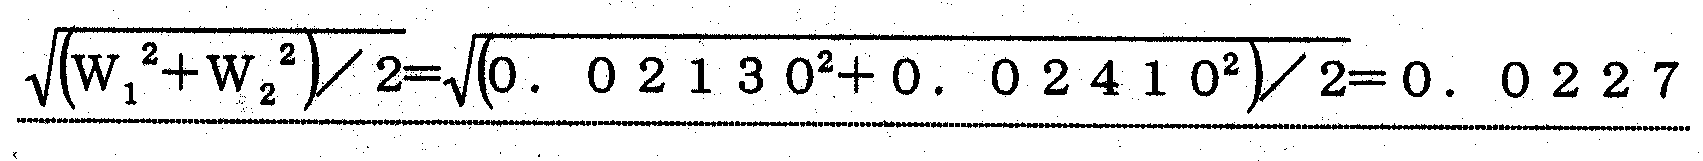 Figure 112003000861169-pat00009